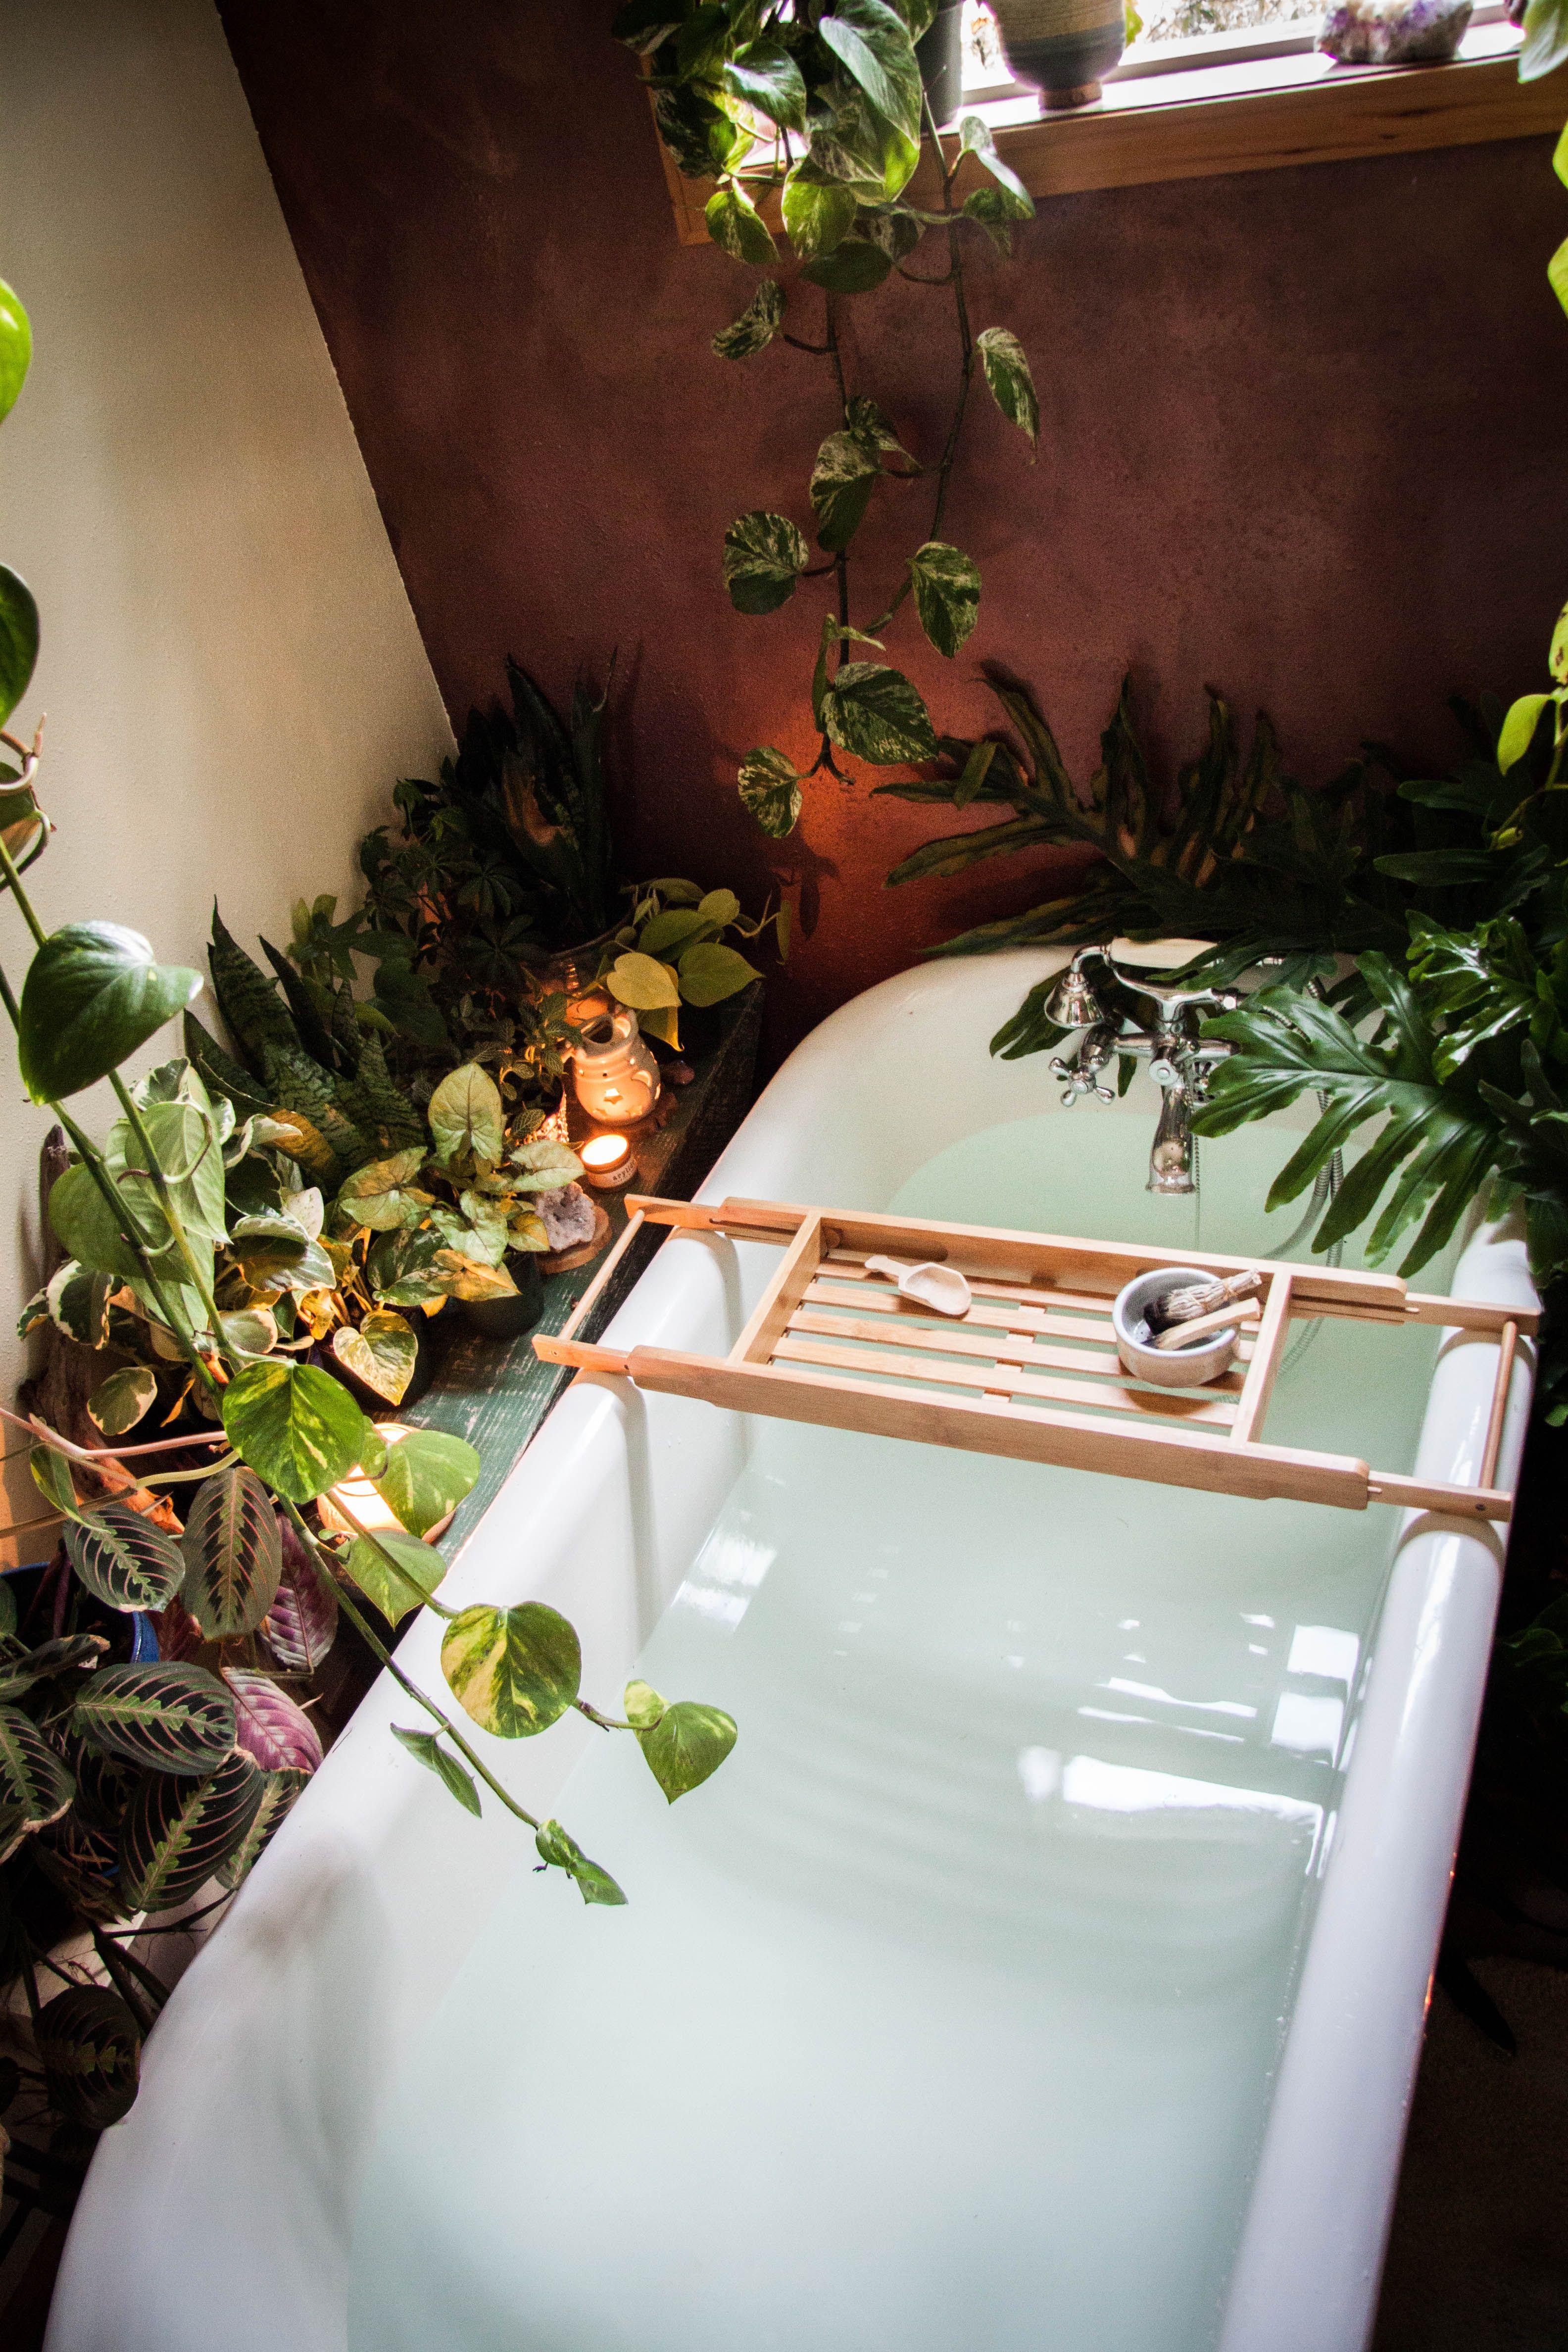 BEING's Urban jungalicious bathtub dream scene. #anthrofave #jungalowstyle #urbanjunglebloggers